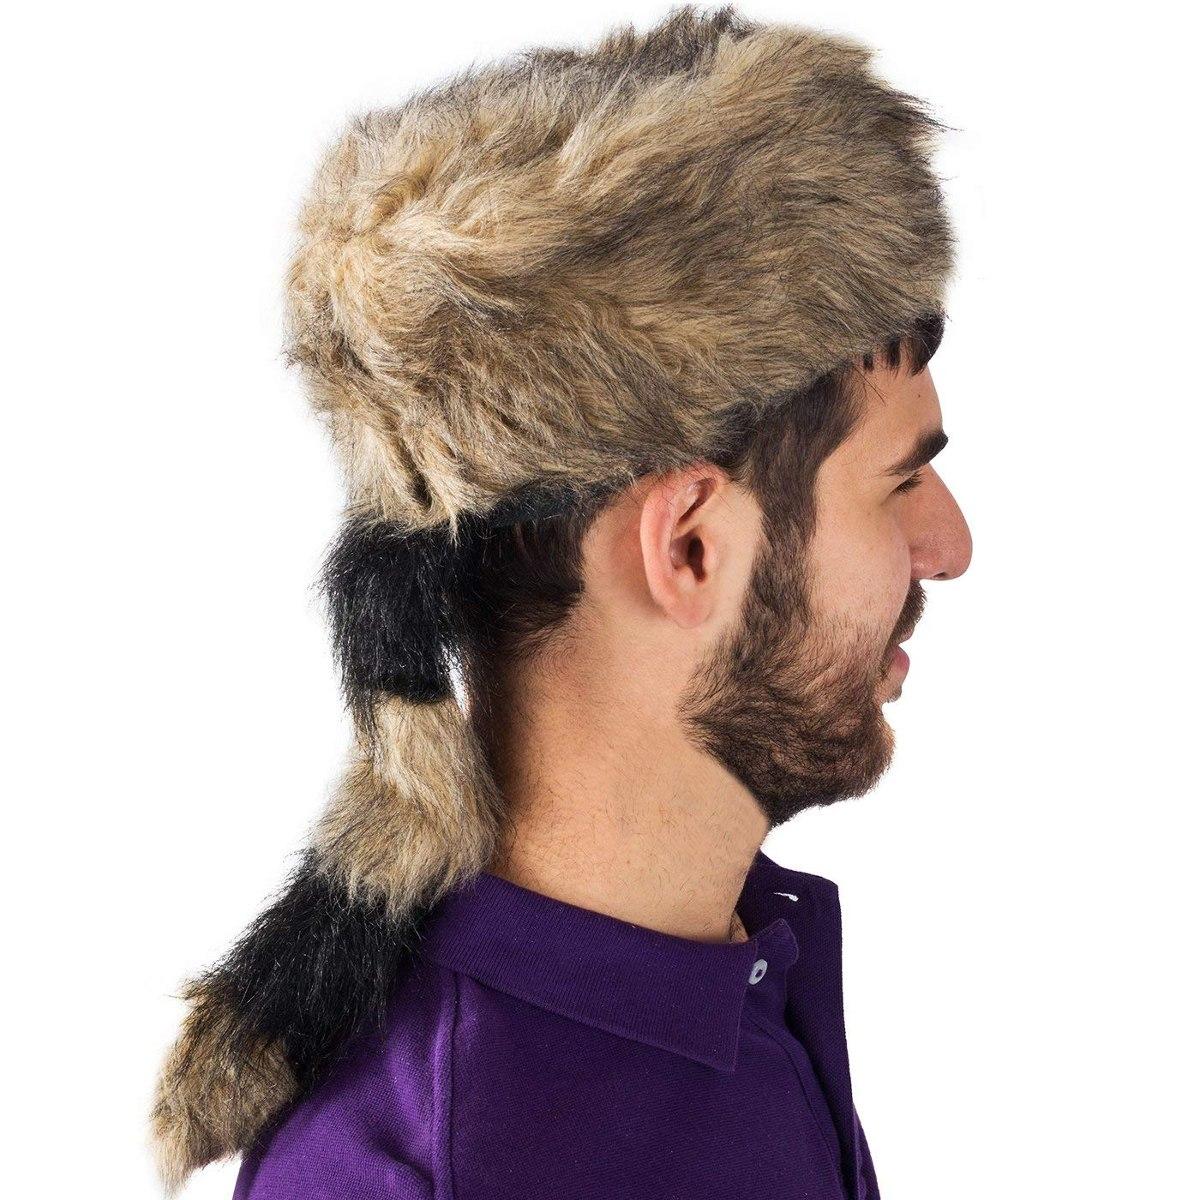 venta más barata venta online fuerte embalaje Halloween Coonskin Cap - Daniel Boone Sombrero Del Mapache D